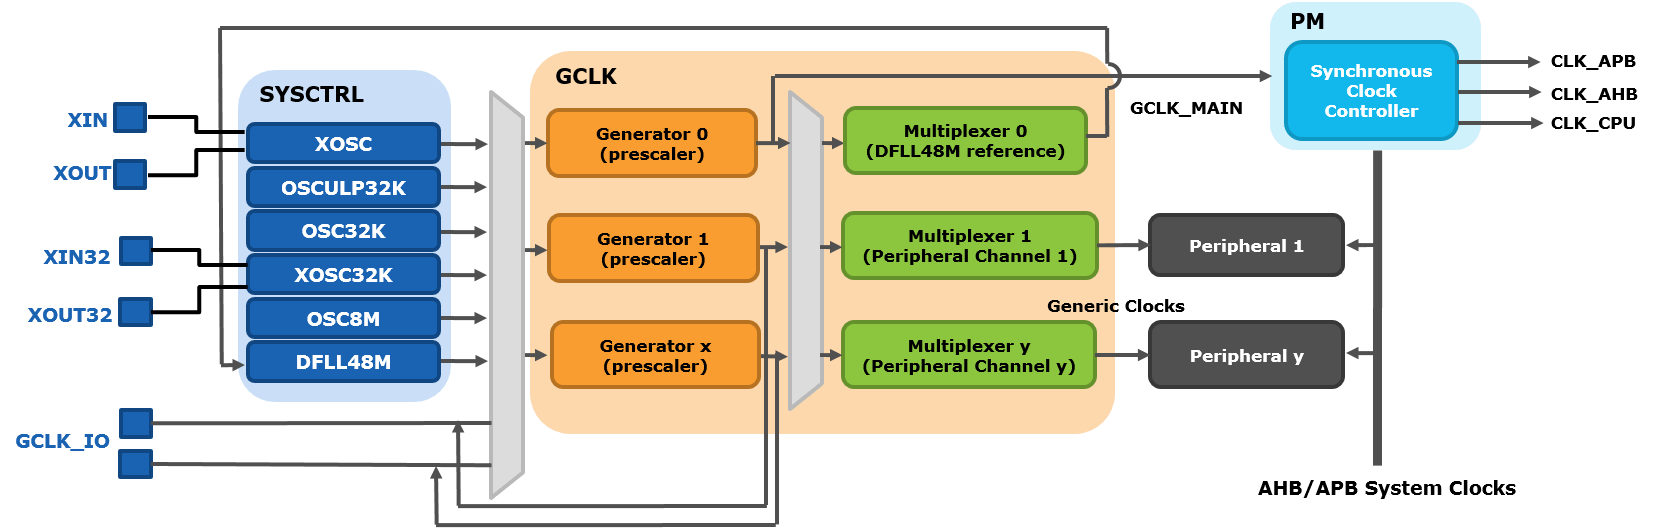 hight resolution of samd21 clock system block diagram detail png